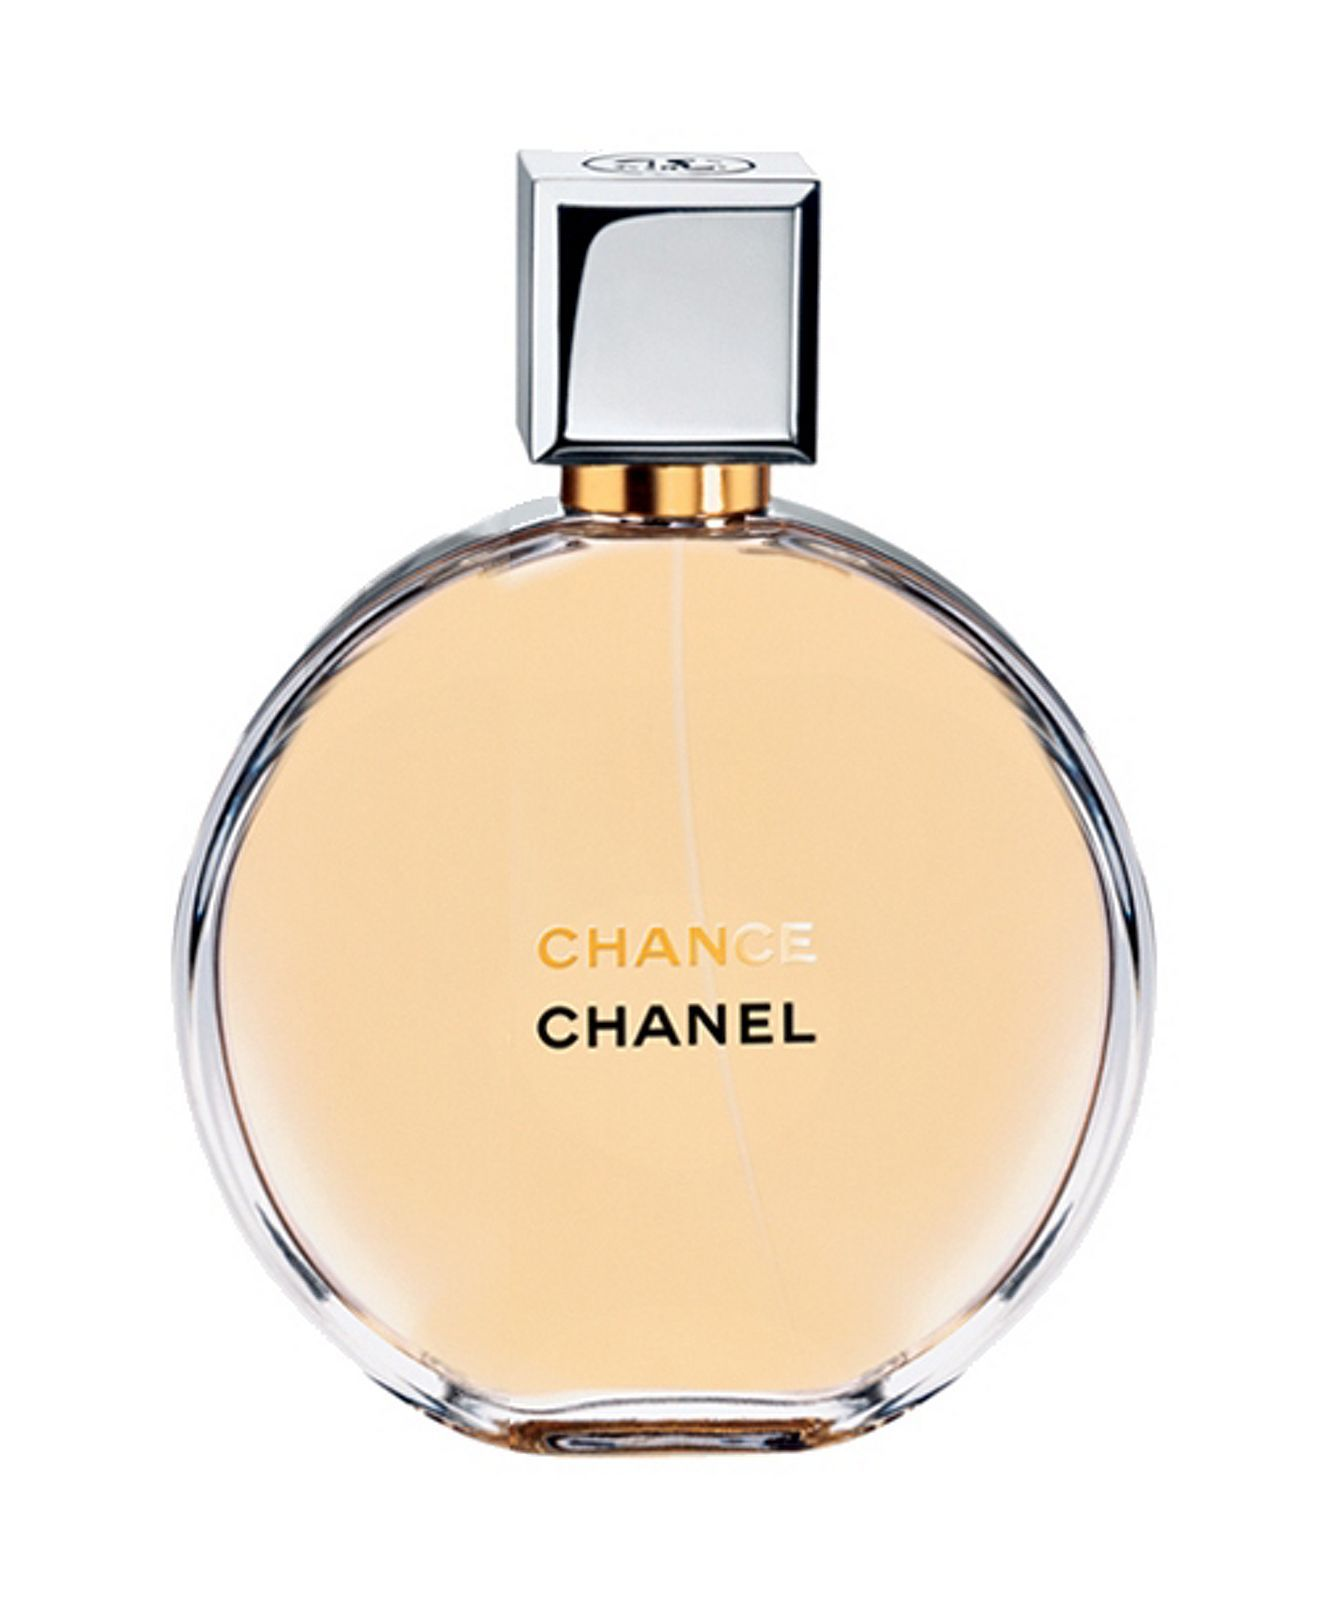 Fragrance Collector Eau Parfum De Perfume CollectionScent OkXZiuTlwP